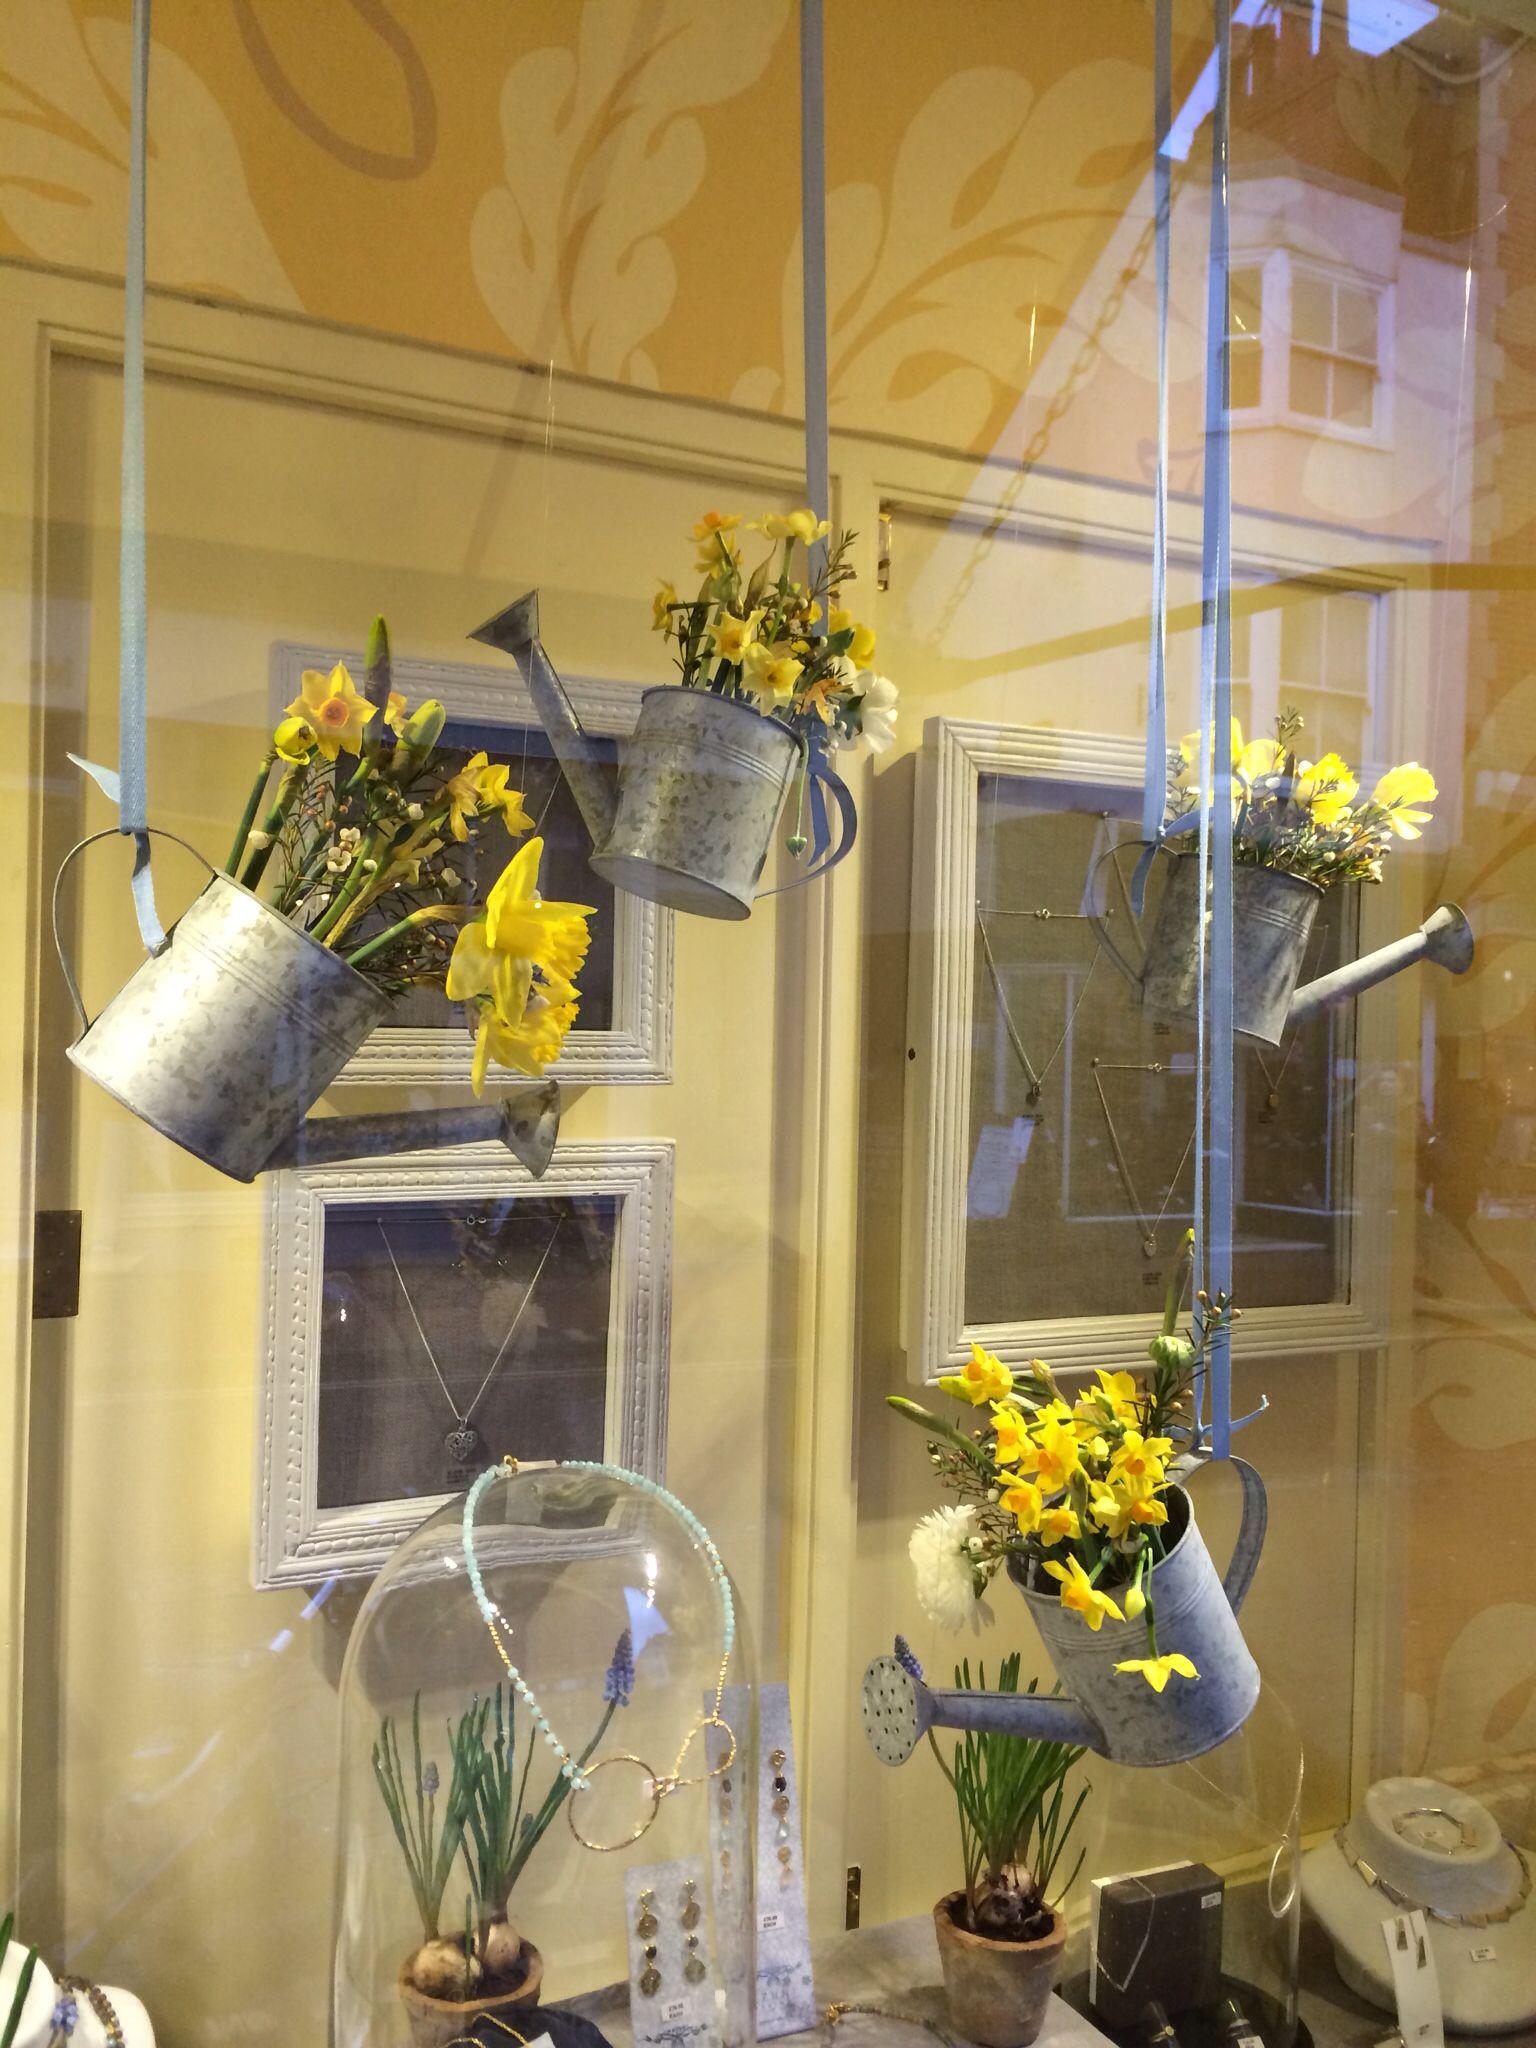 Jewellery shop window in Brighton